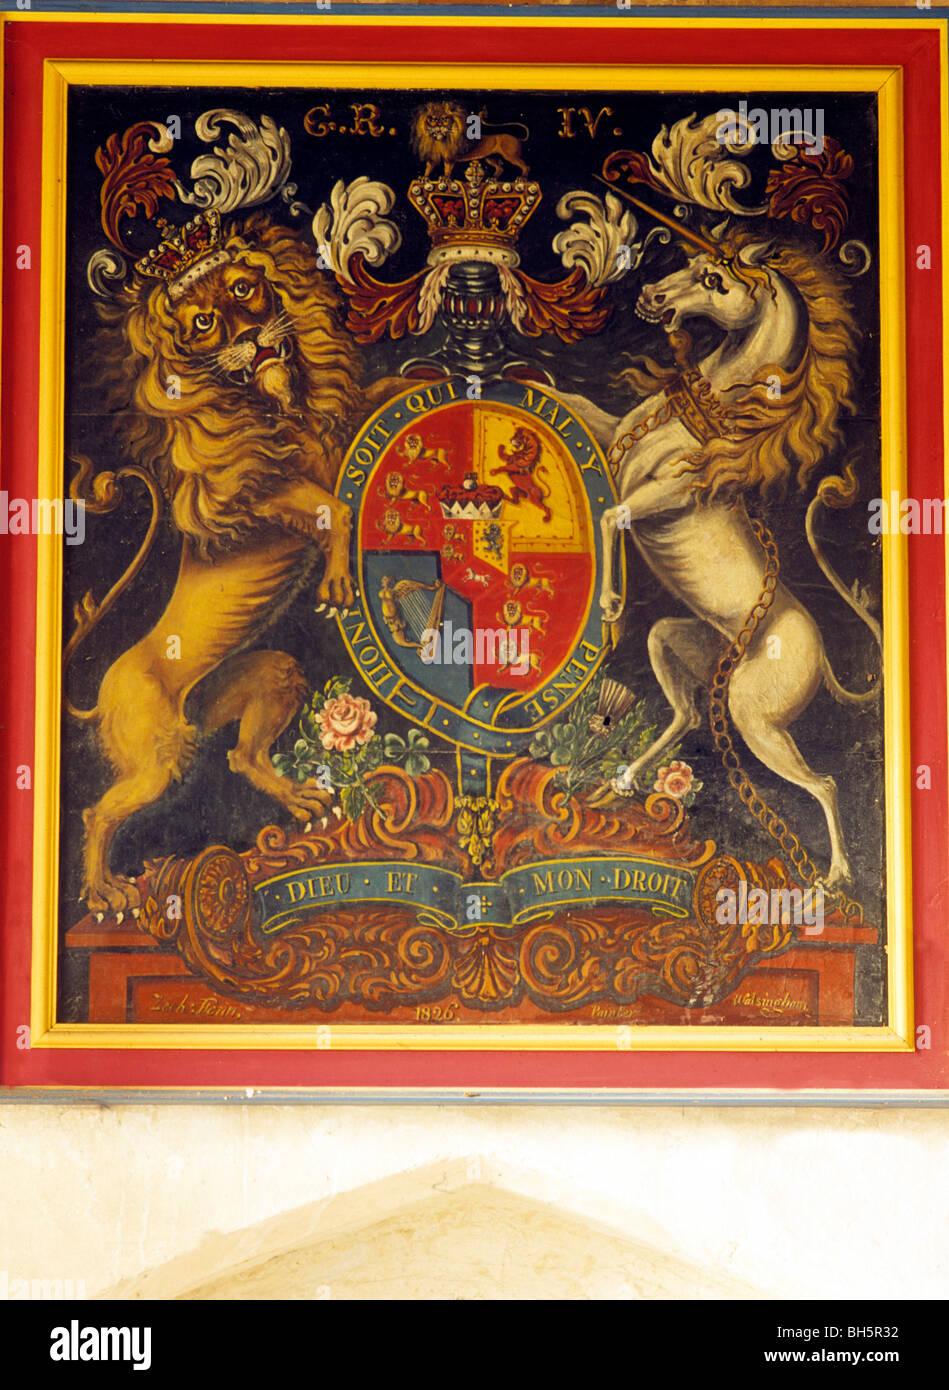 Burnham Norton, Arms of King George IV Royal coat of arms heraldry heraldic device English devices lion lions unicorn - Stock Image